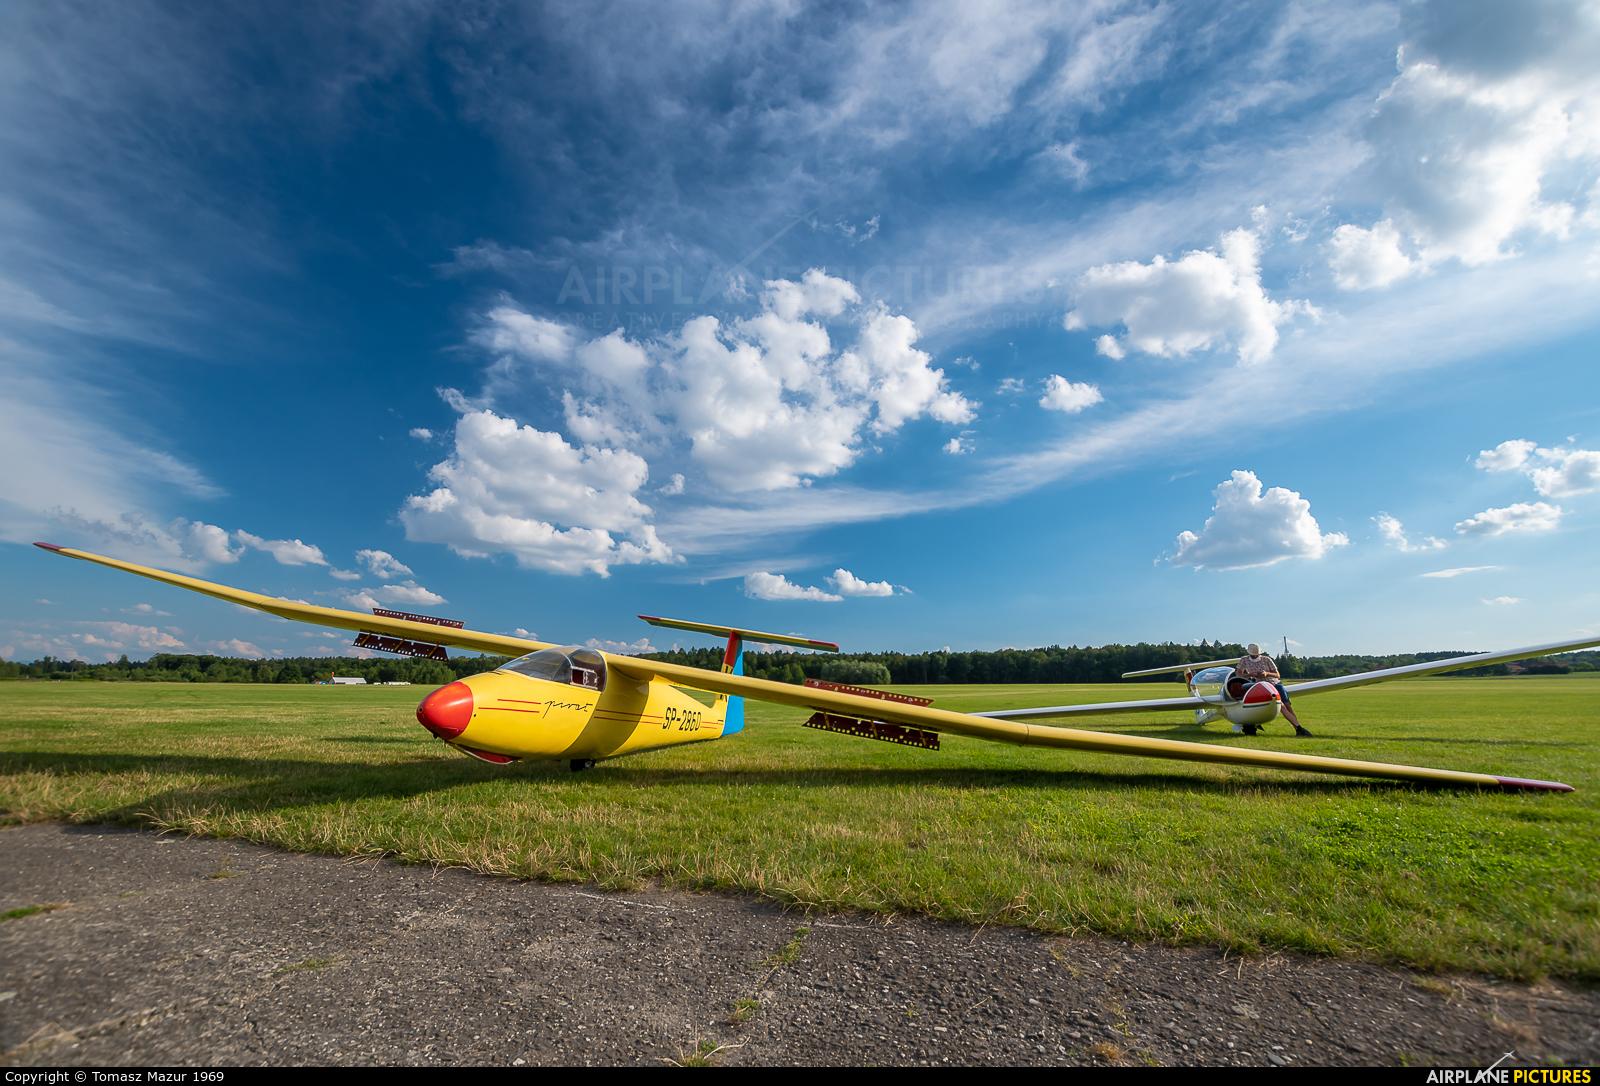 Aeroclub ROW SP-2680 aircraft at Rybnik - Gotartowice